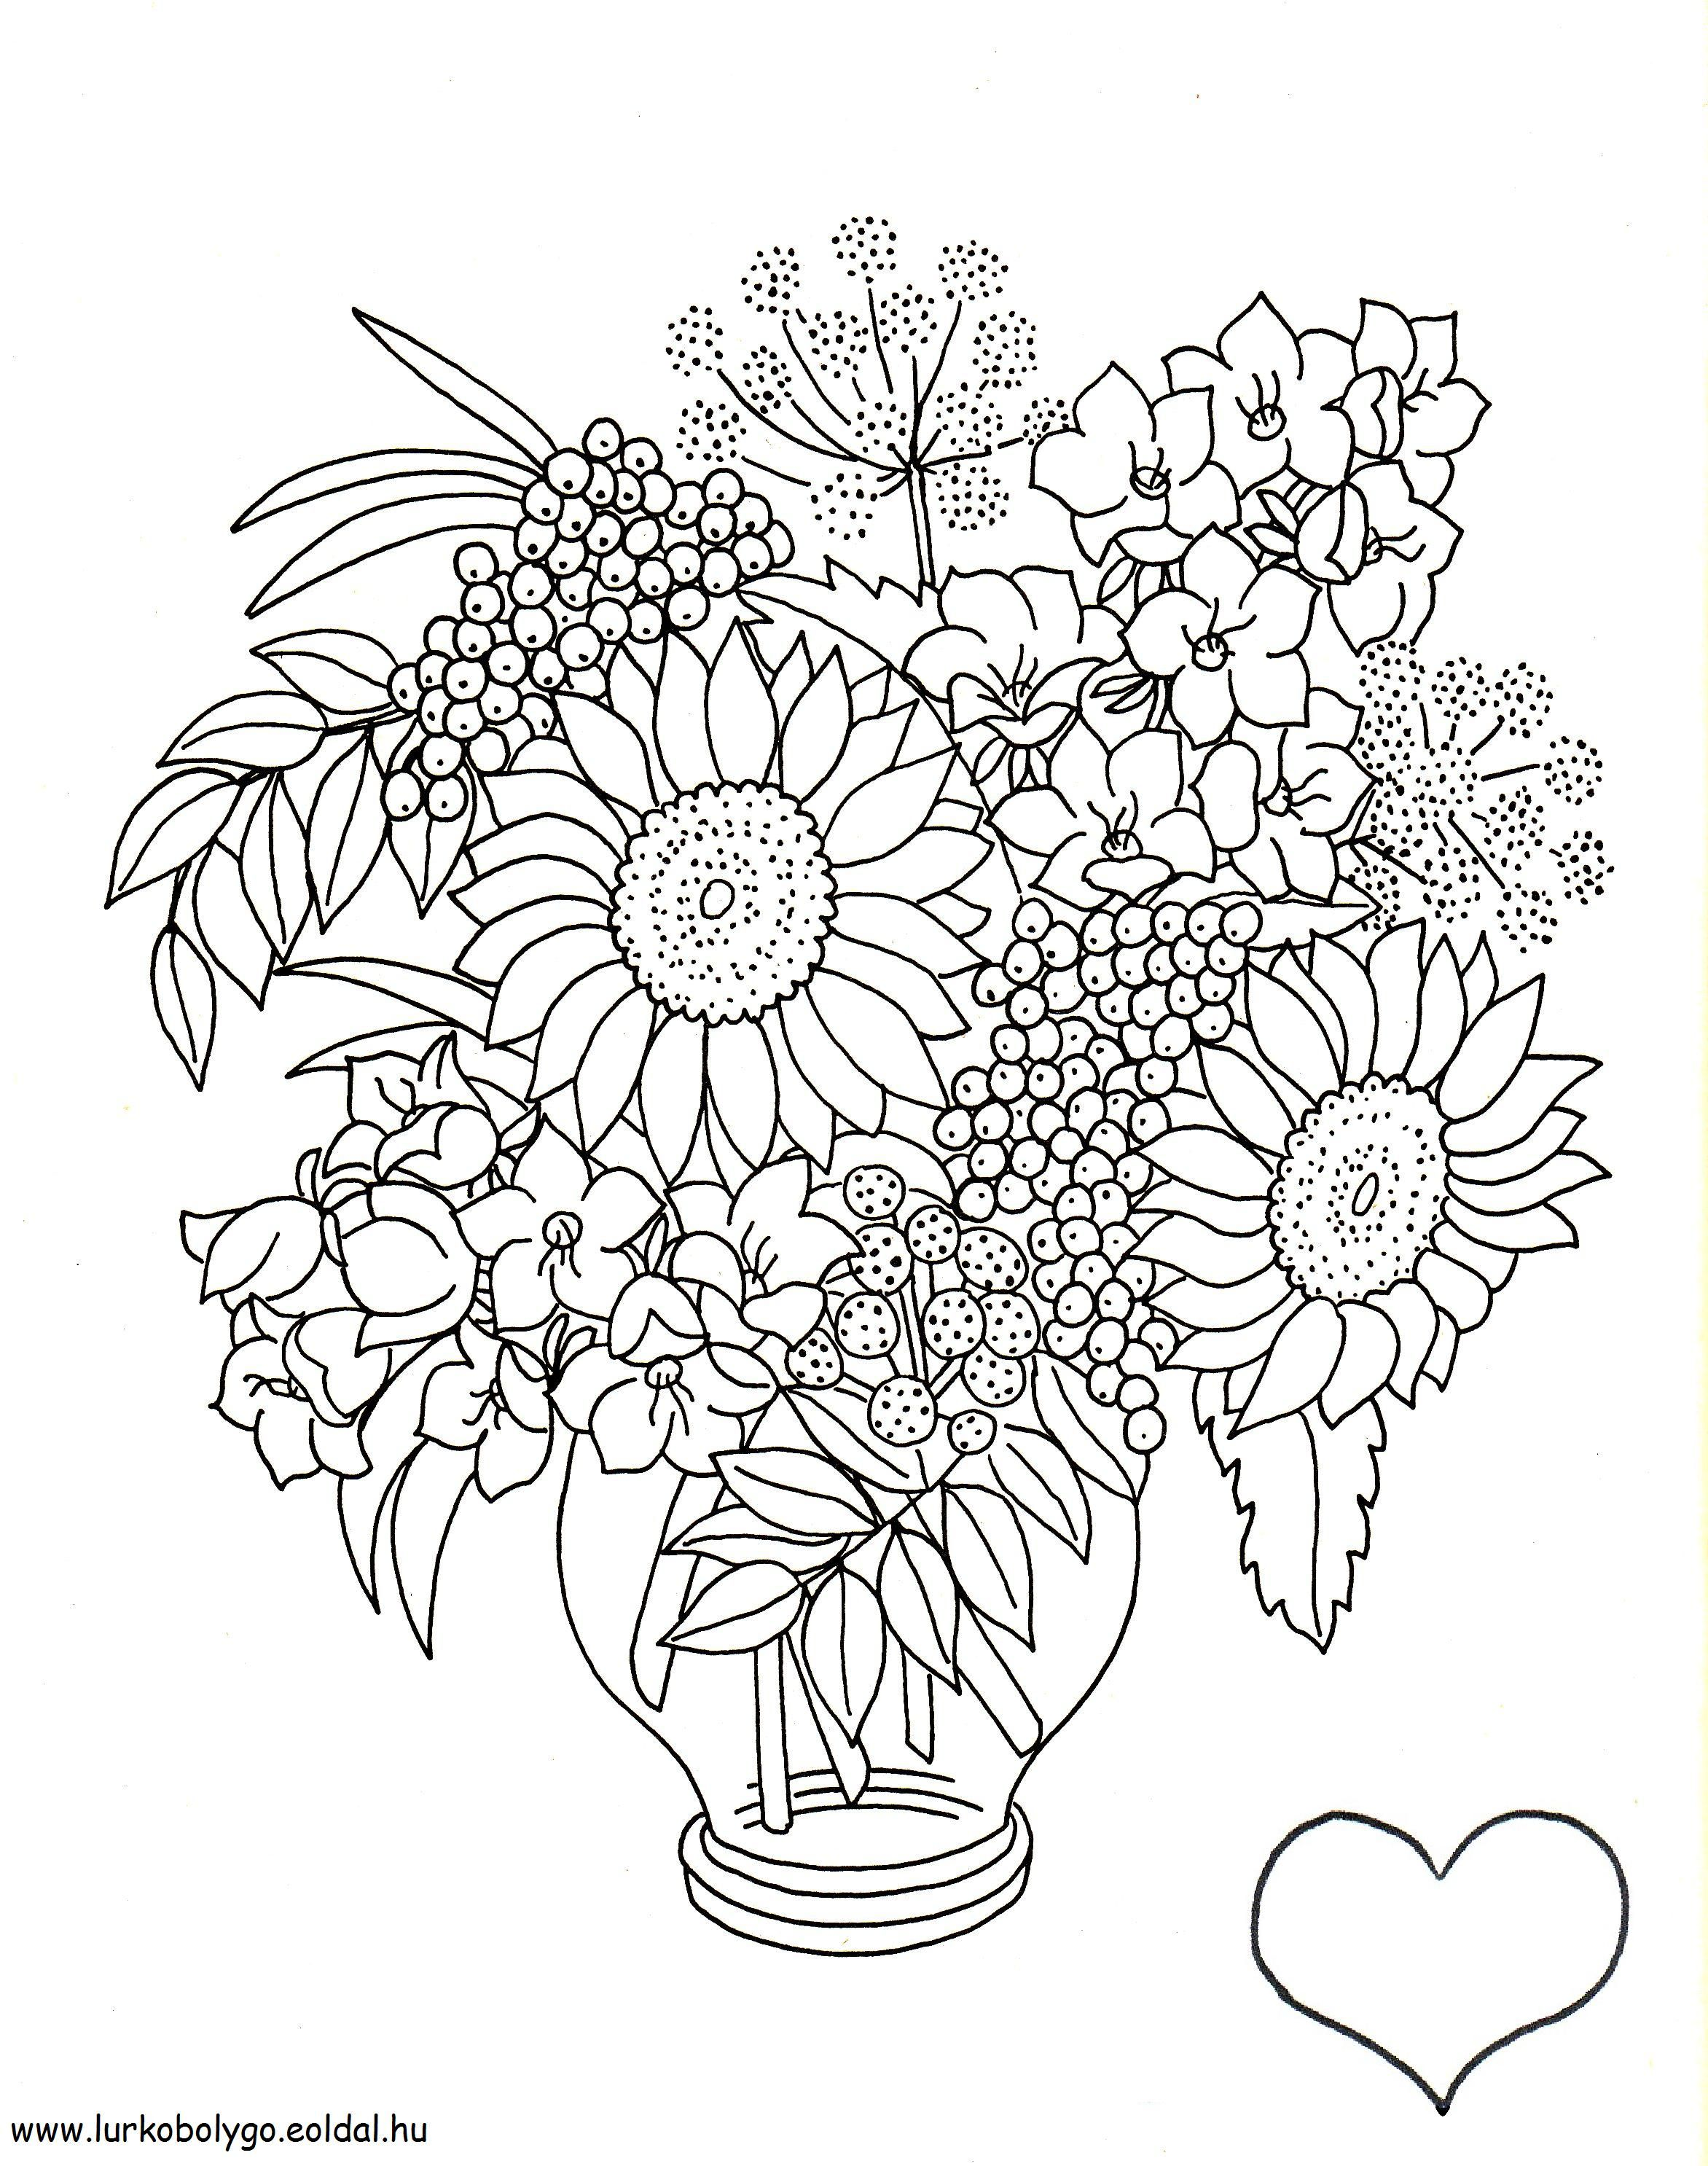 Ausmalbilder Erwachsene Blumen : Viragcsokor Jpg 2344 2972 Sz Nez K Sablonok Oktat S Pinterest